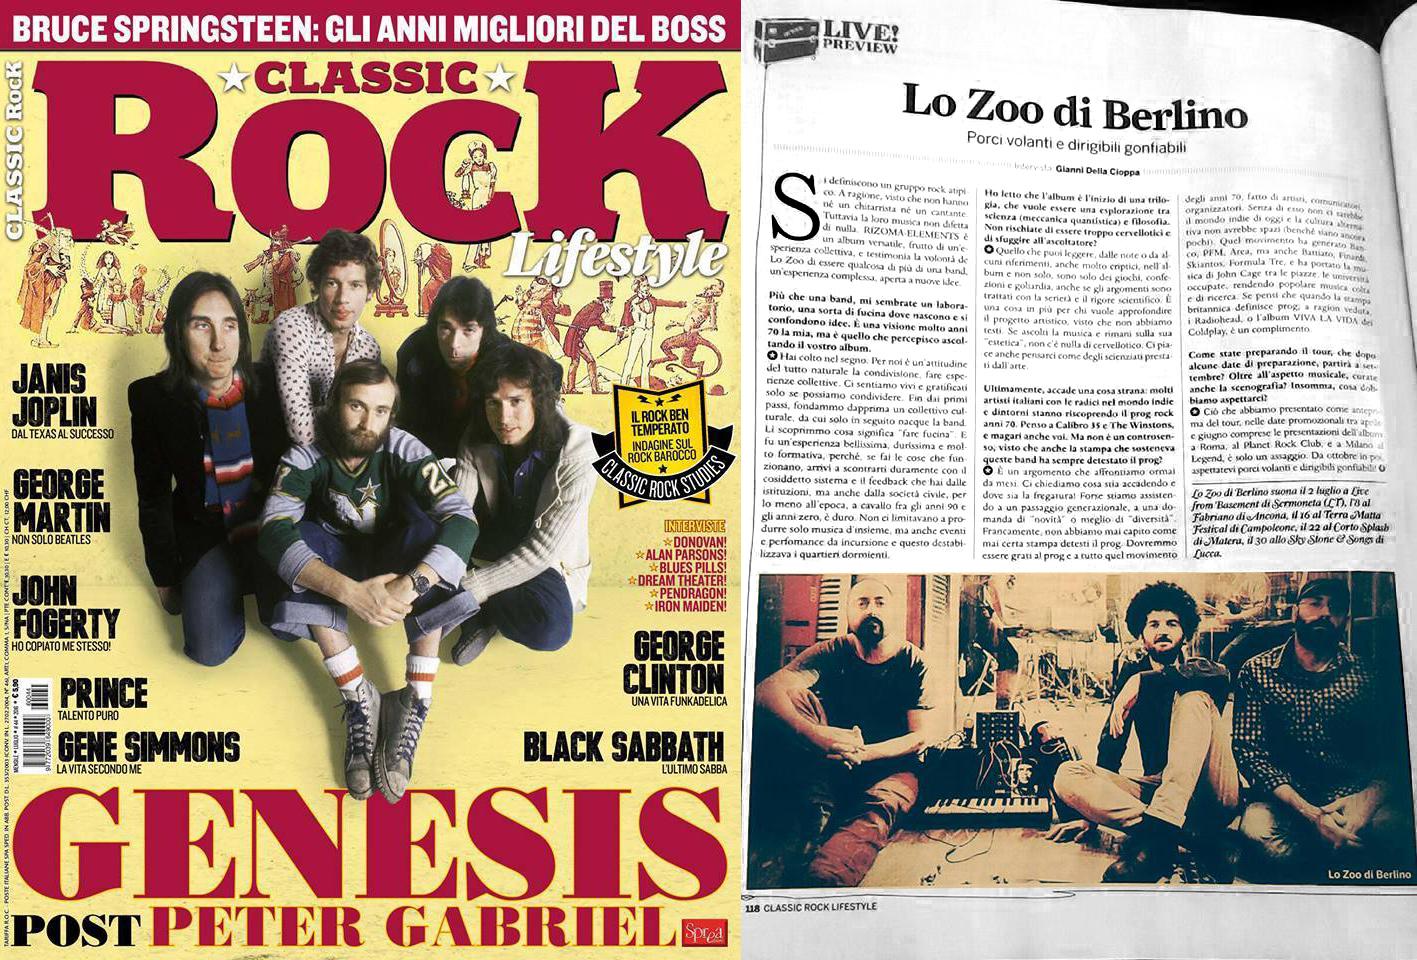 Classic Rock Italia Interview